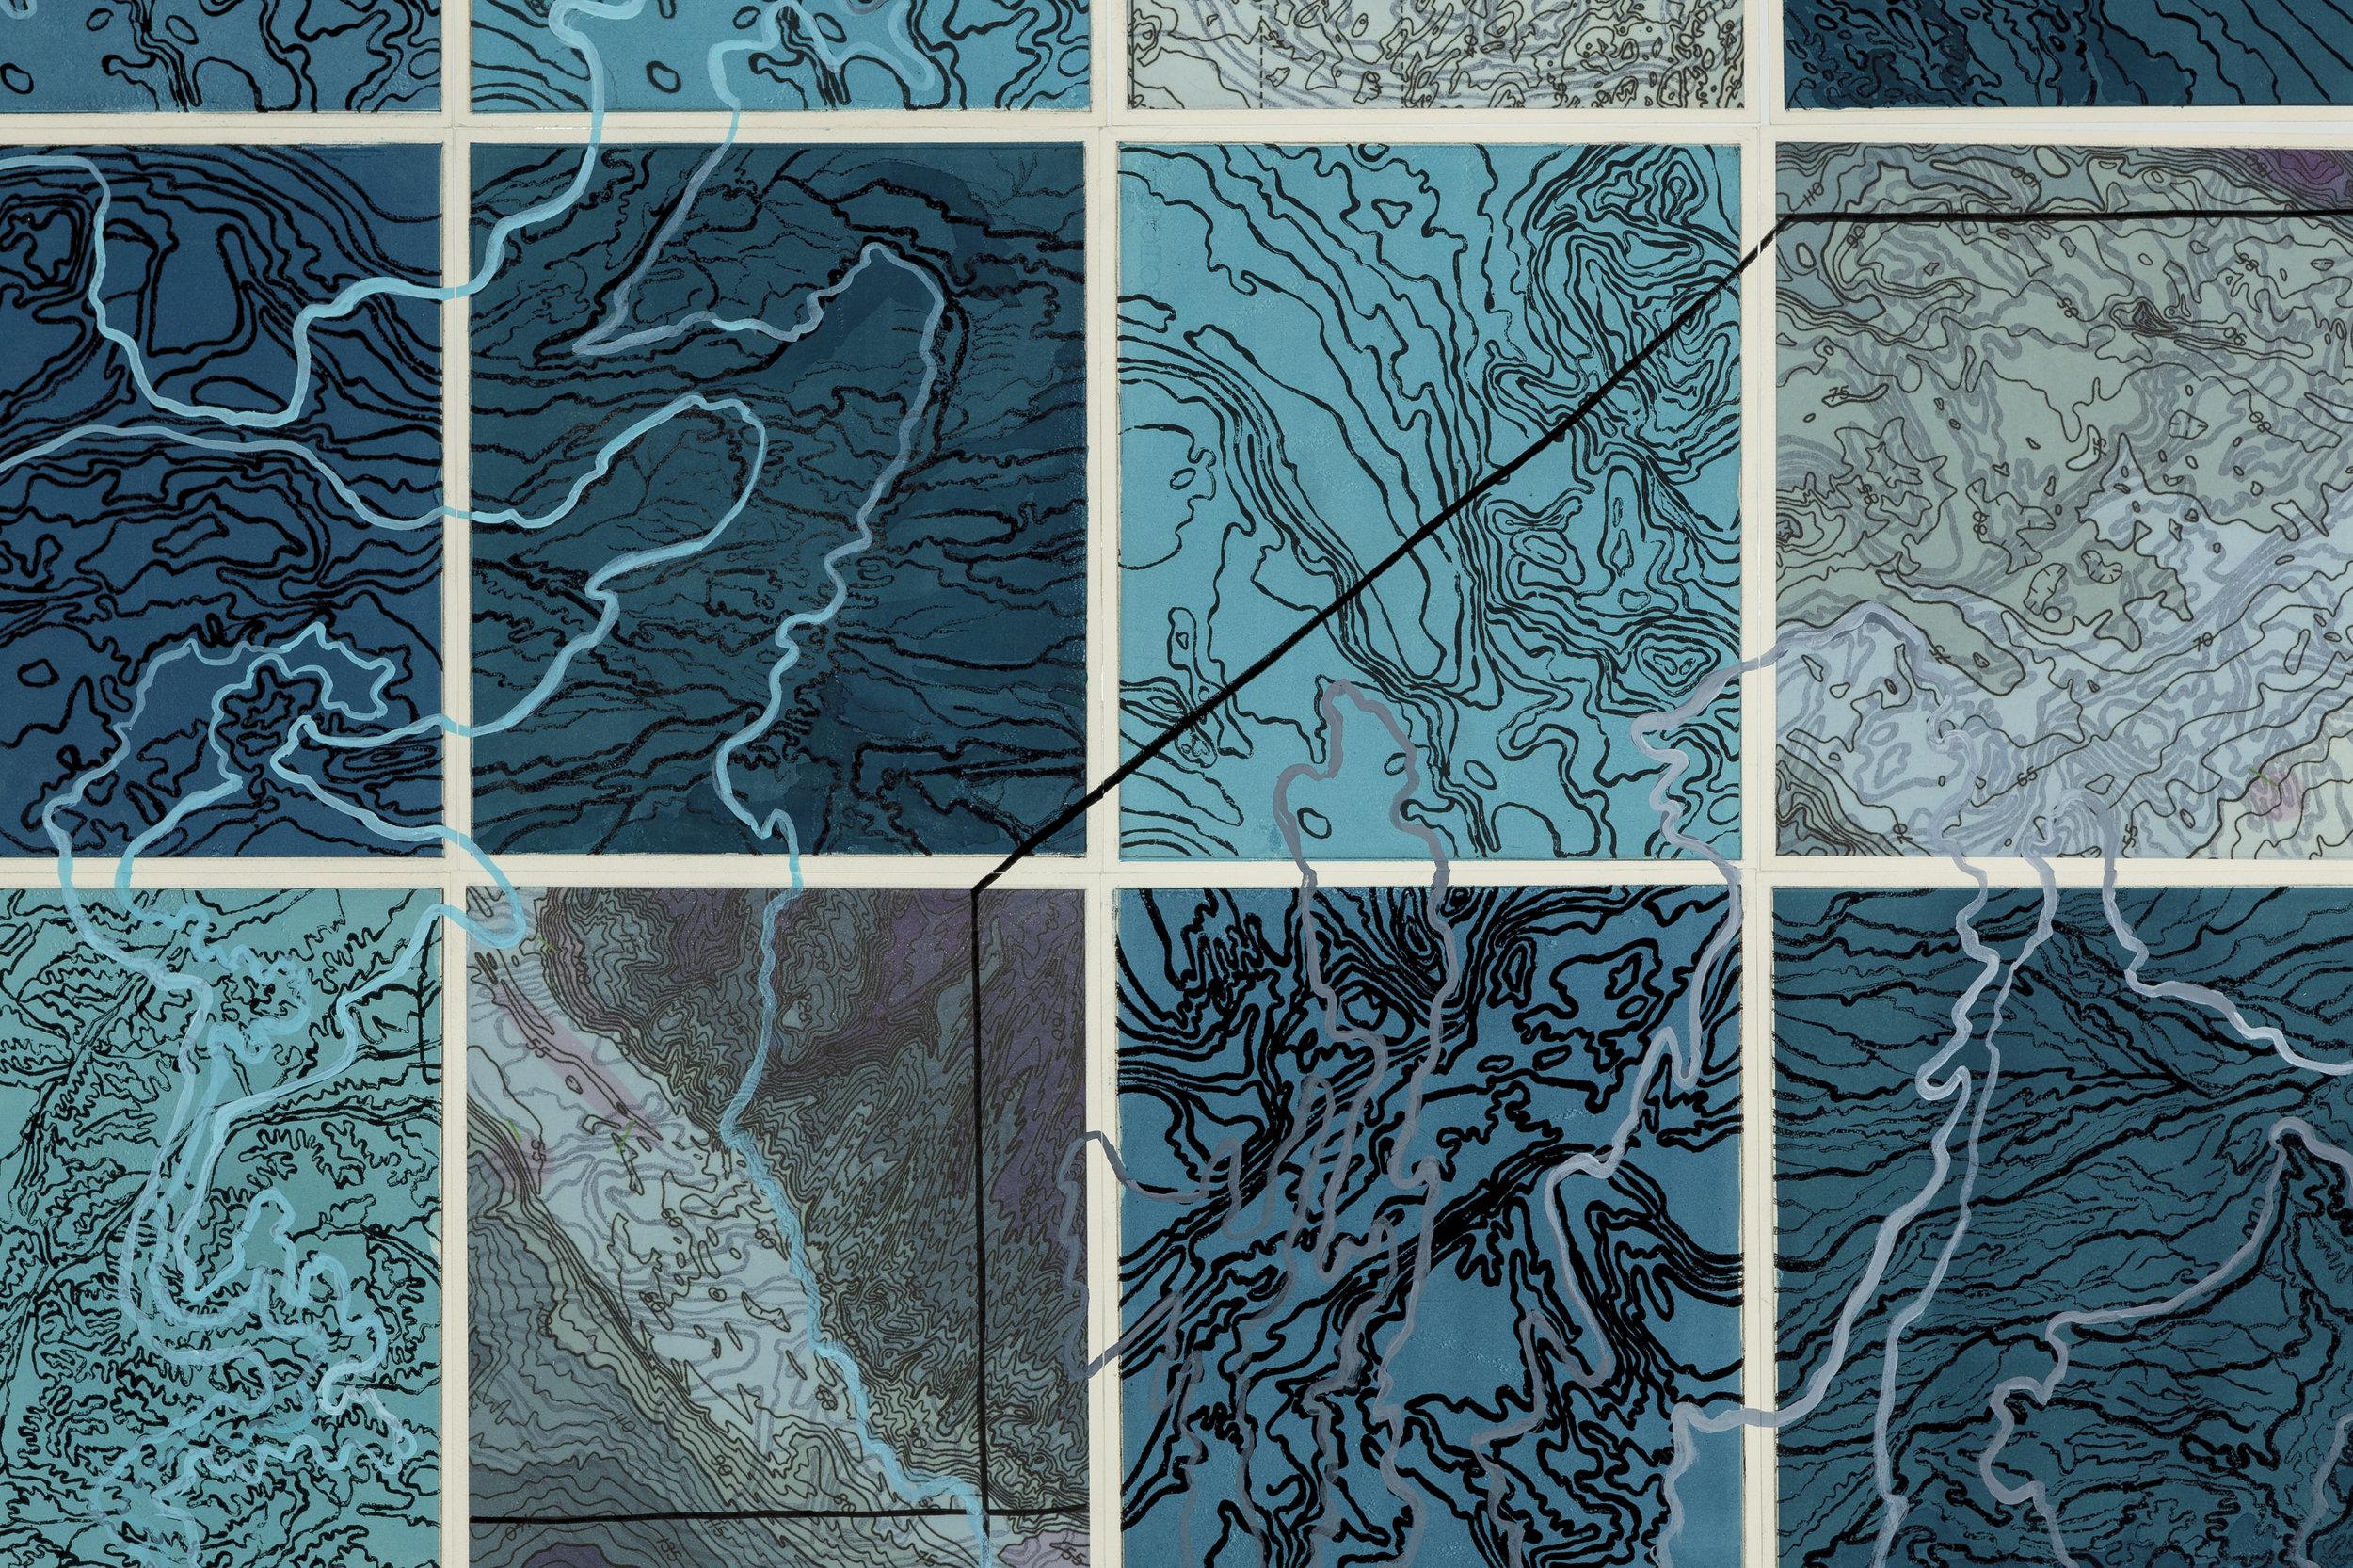 Parvat/Sagar, 2 017   Detail - intaglio sugar lift, line etching, surface roll, digital map on kozo-shi, paint